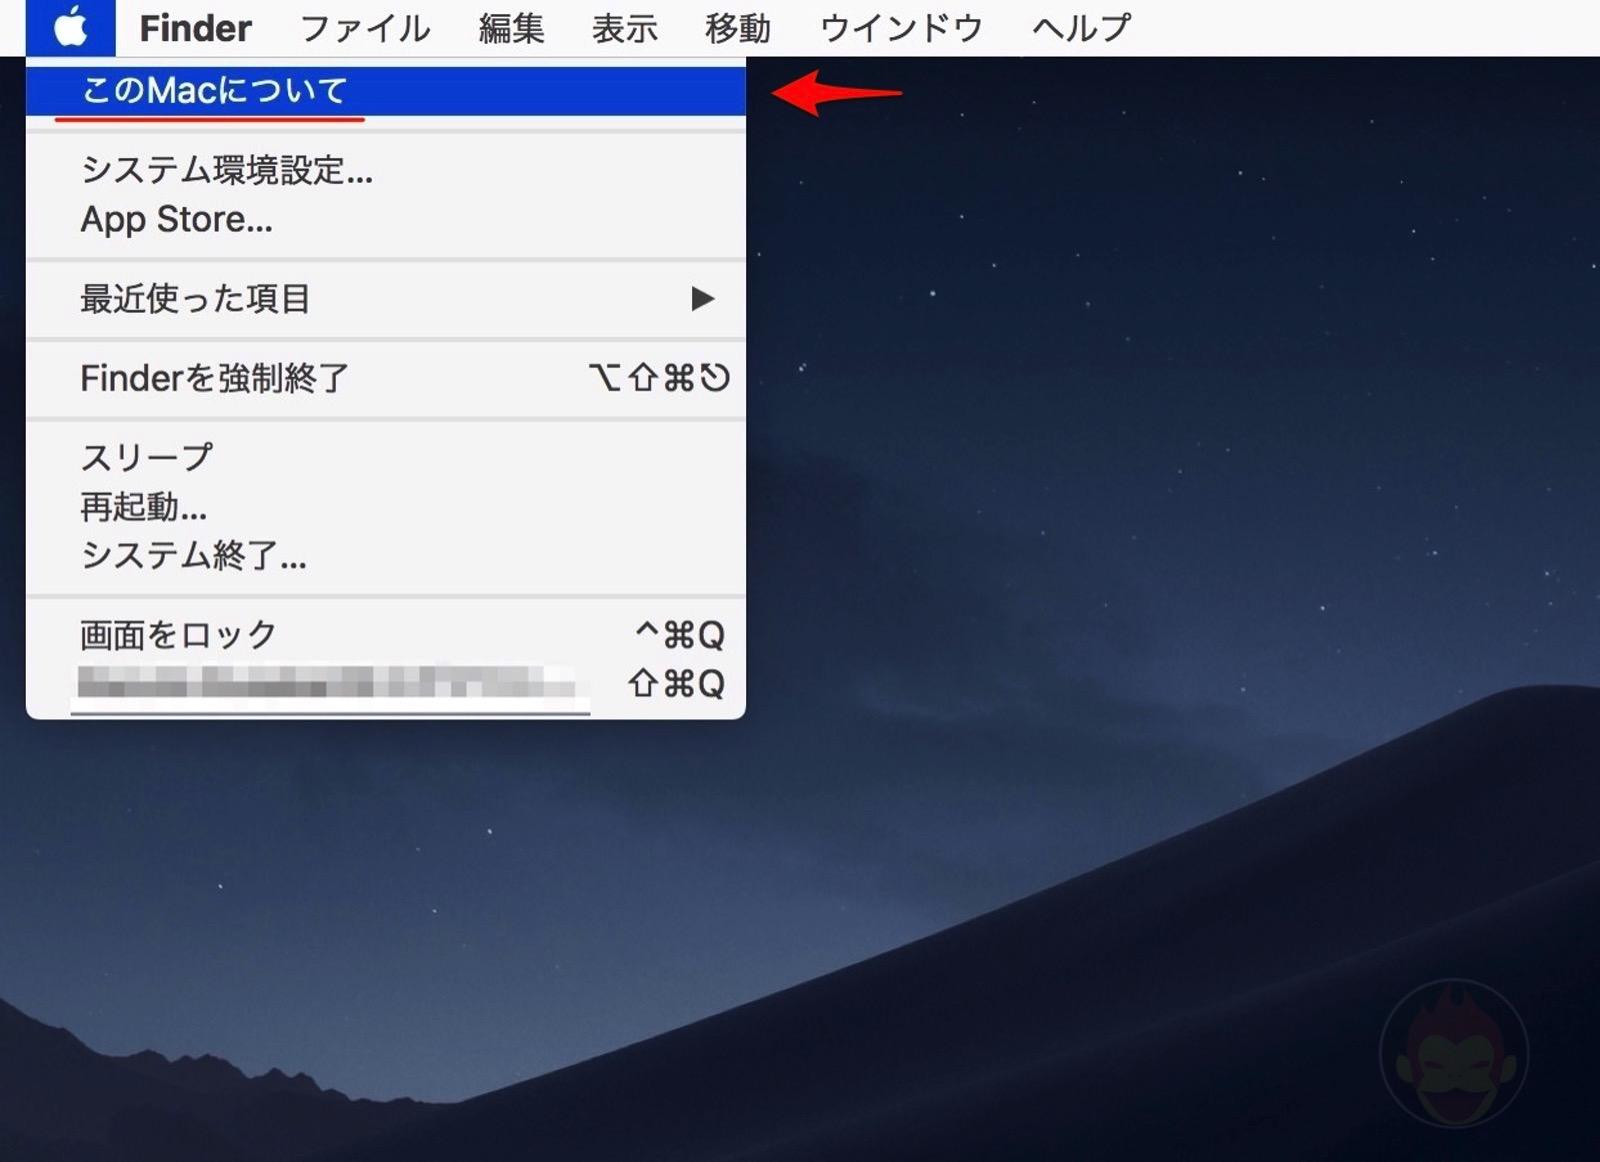 Mac Storage Apple Video 02